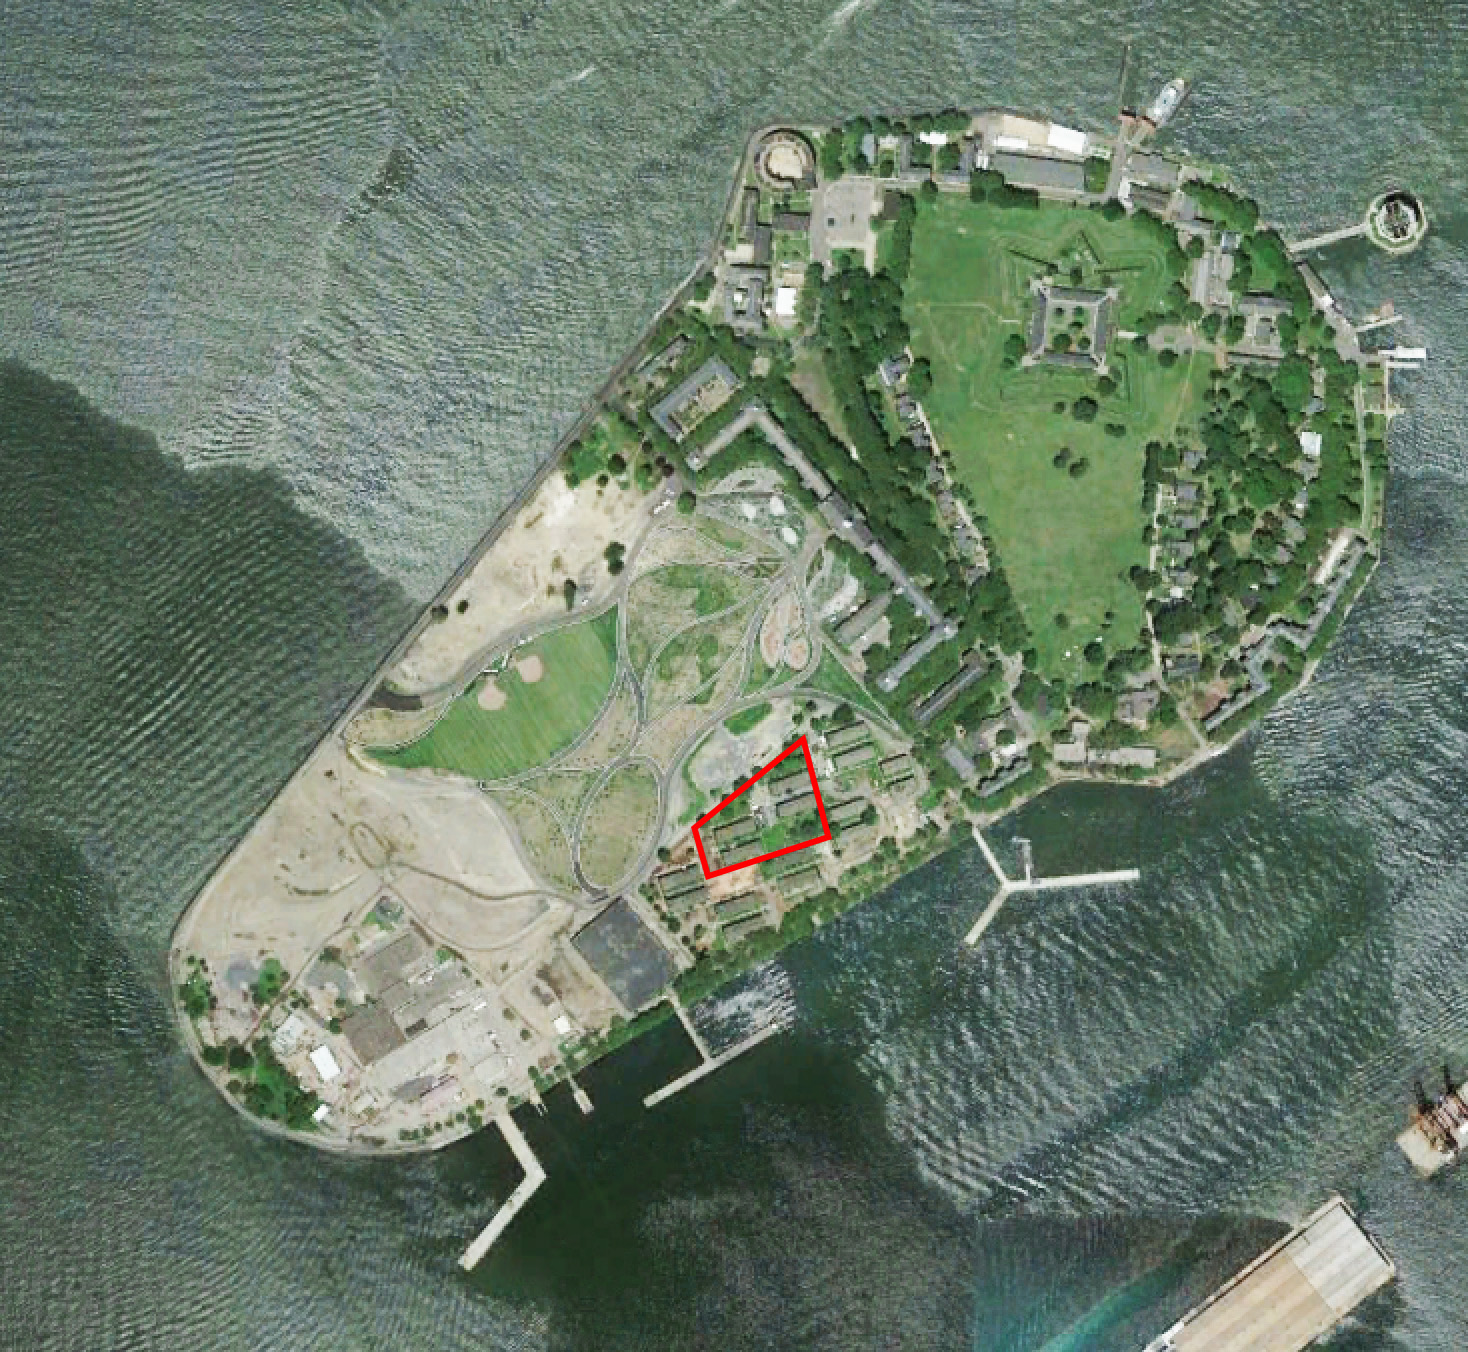 google earth earth matter ny s location on the island